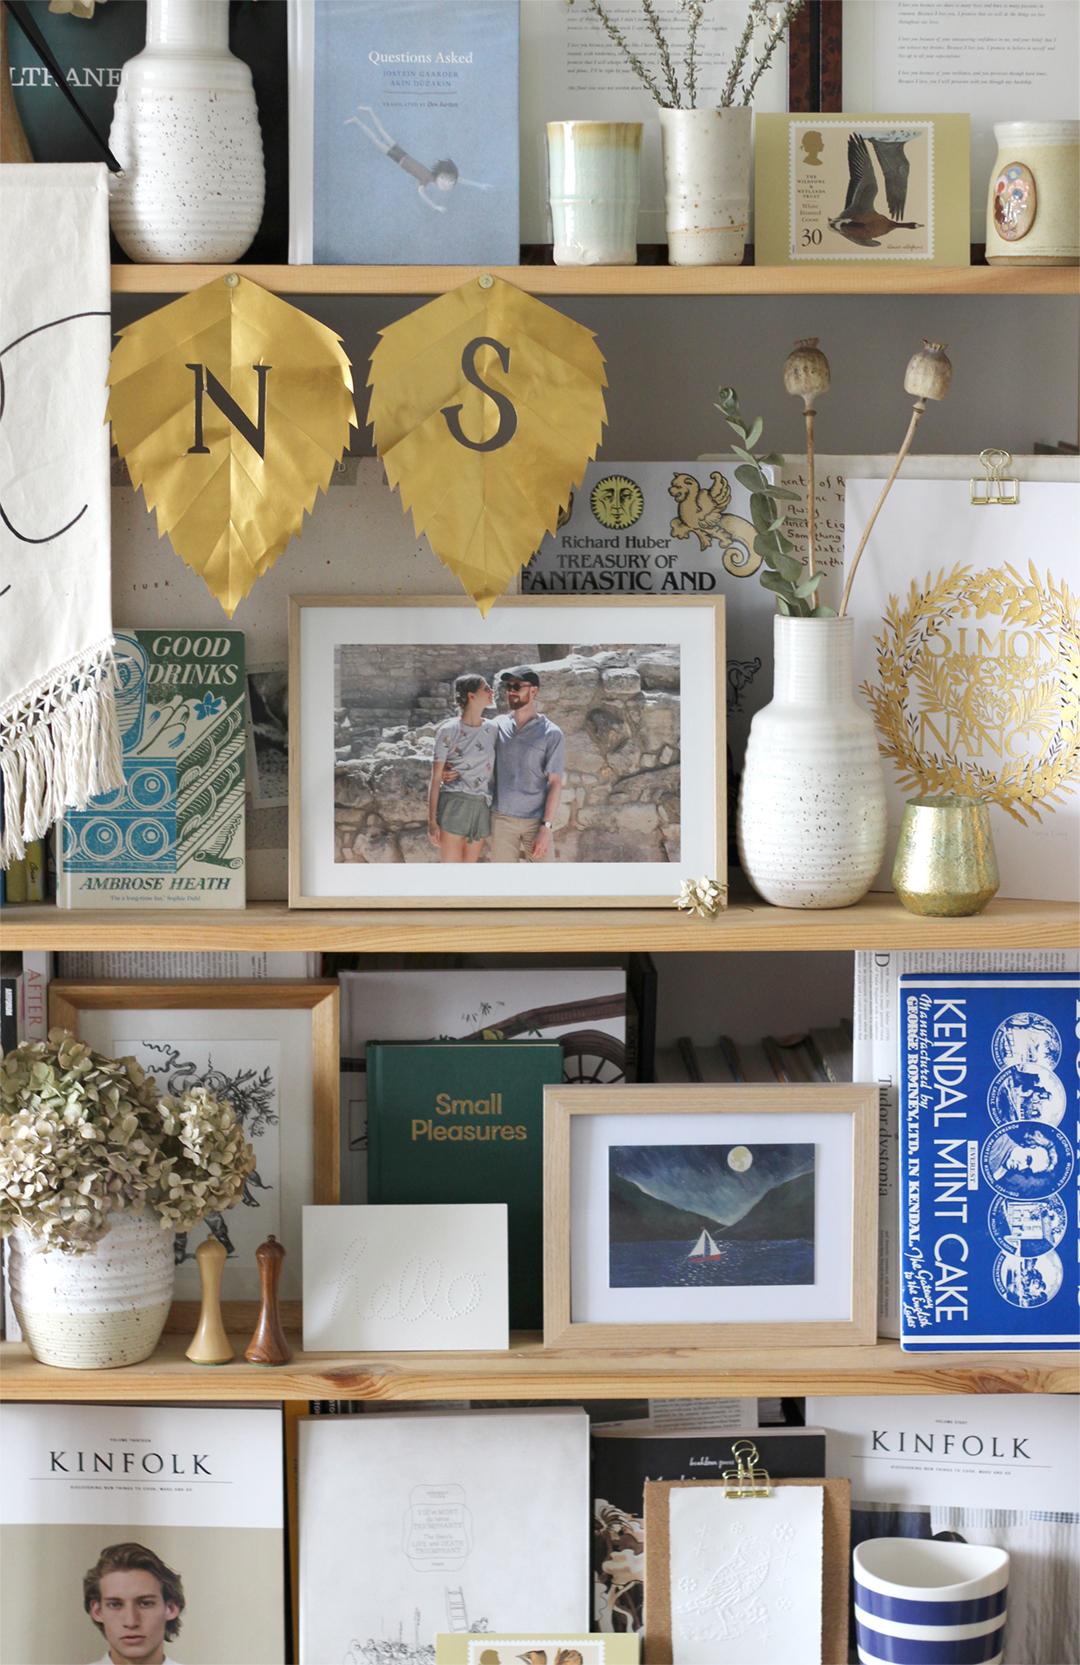 nancy-straughan-interior-stylist-styled-bookshelves-rustic-home.jpg